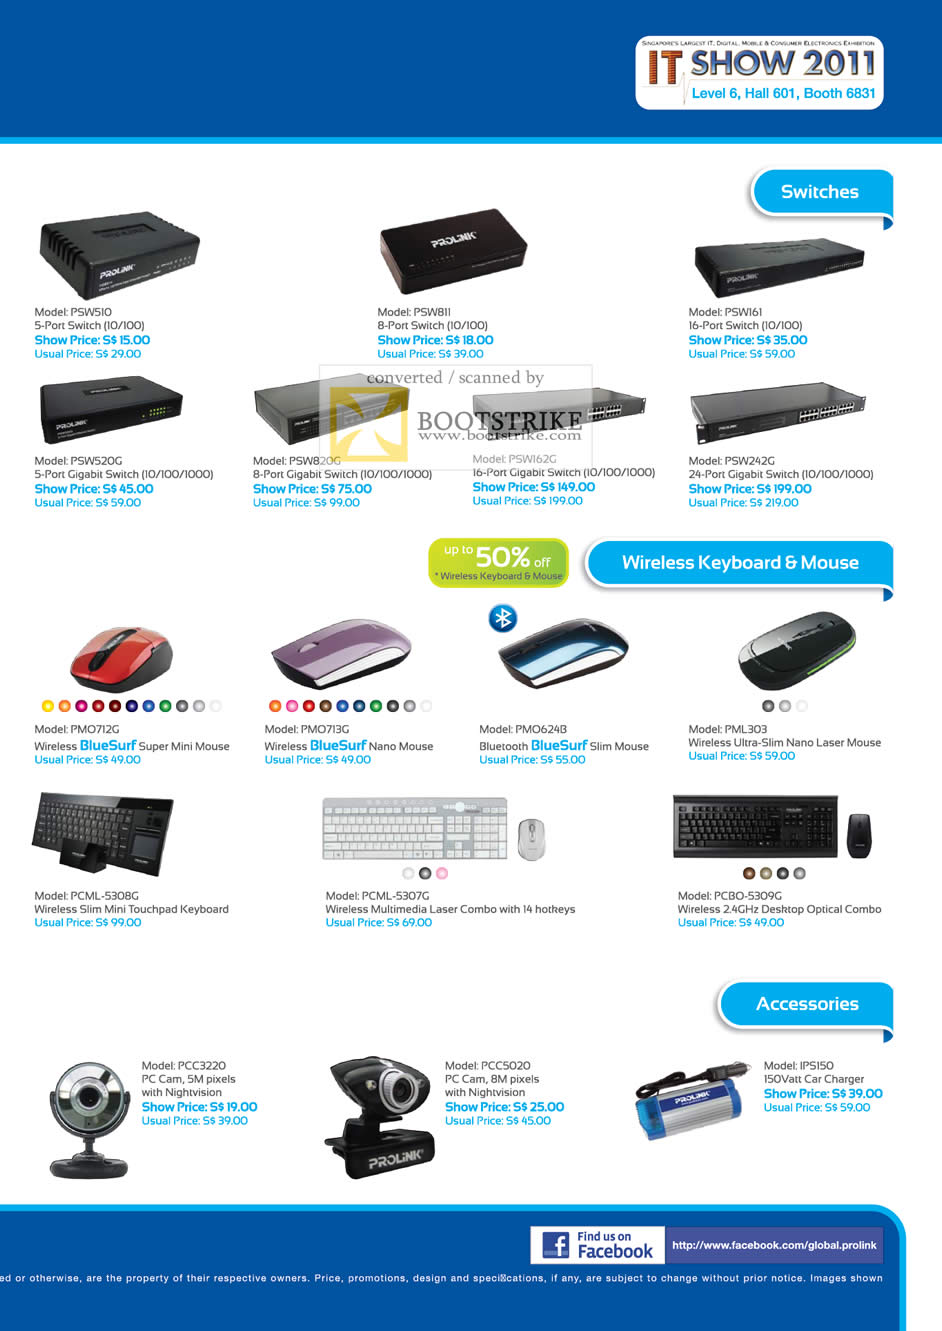 IT Show 2011 price list image brochure of Fida Intl Prolink Gigabit Switch Wireless Keyboard Bluesurf Nano Laser Mouse Webcam Car Charger